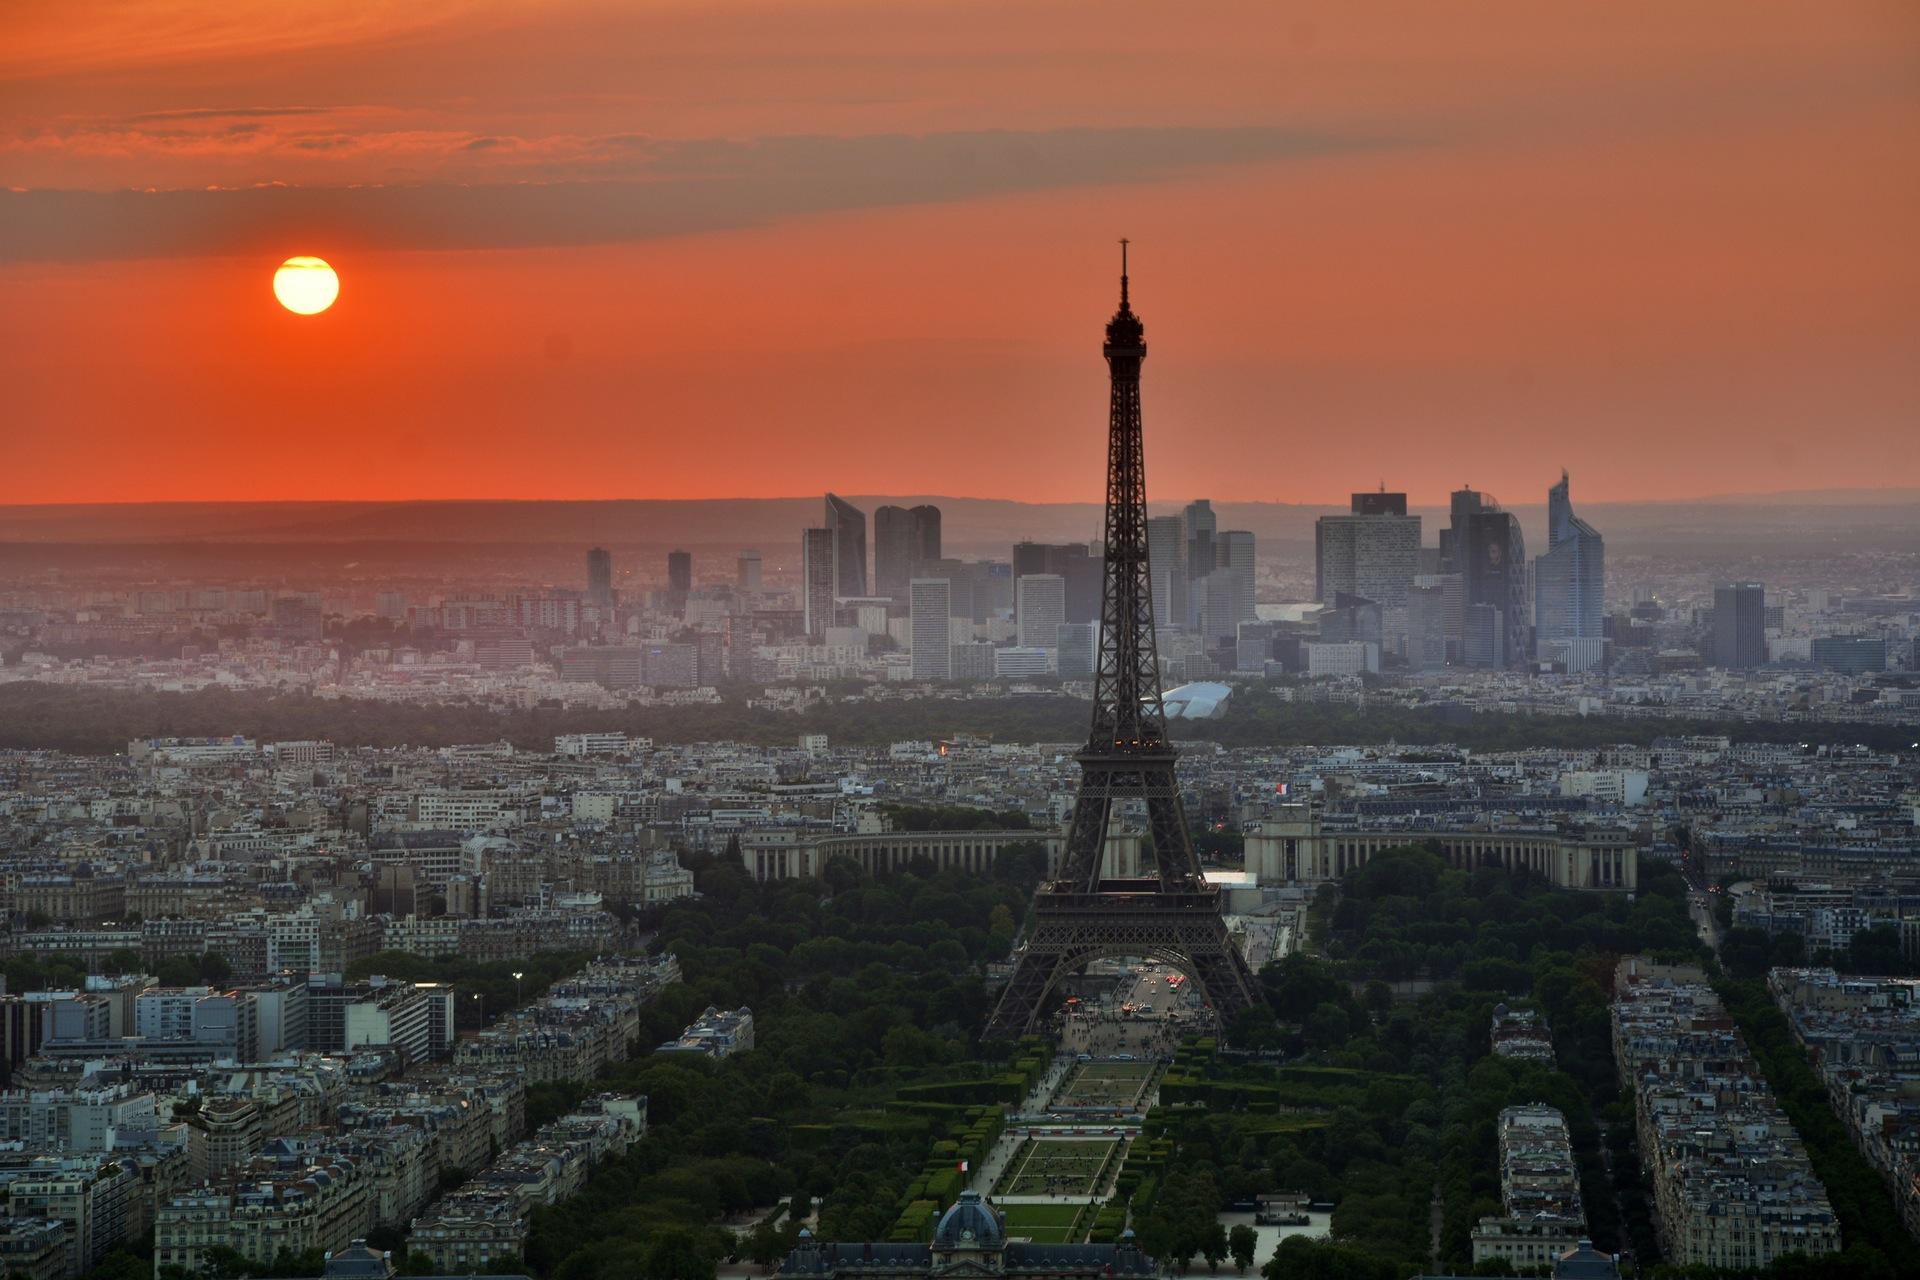 Paris, Eiffelturm, Sonne, Stadt, Frankreich - Wallpaper HD - Prof.-falken.com